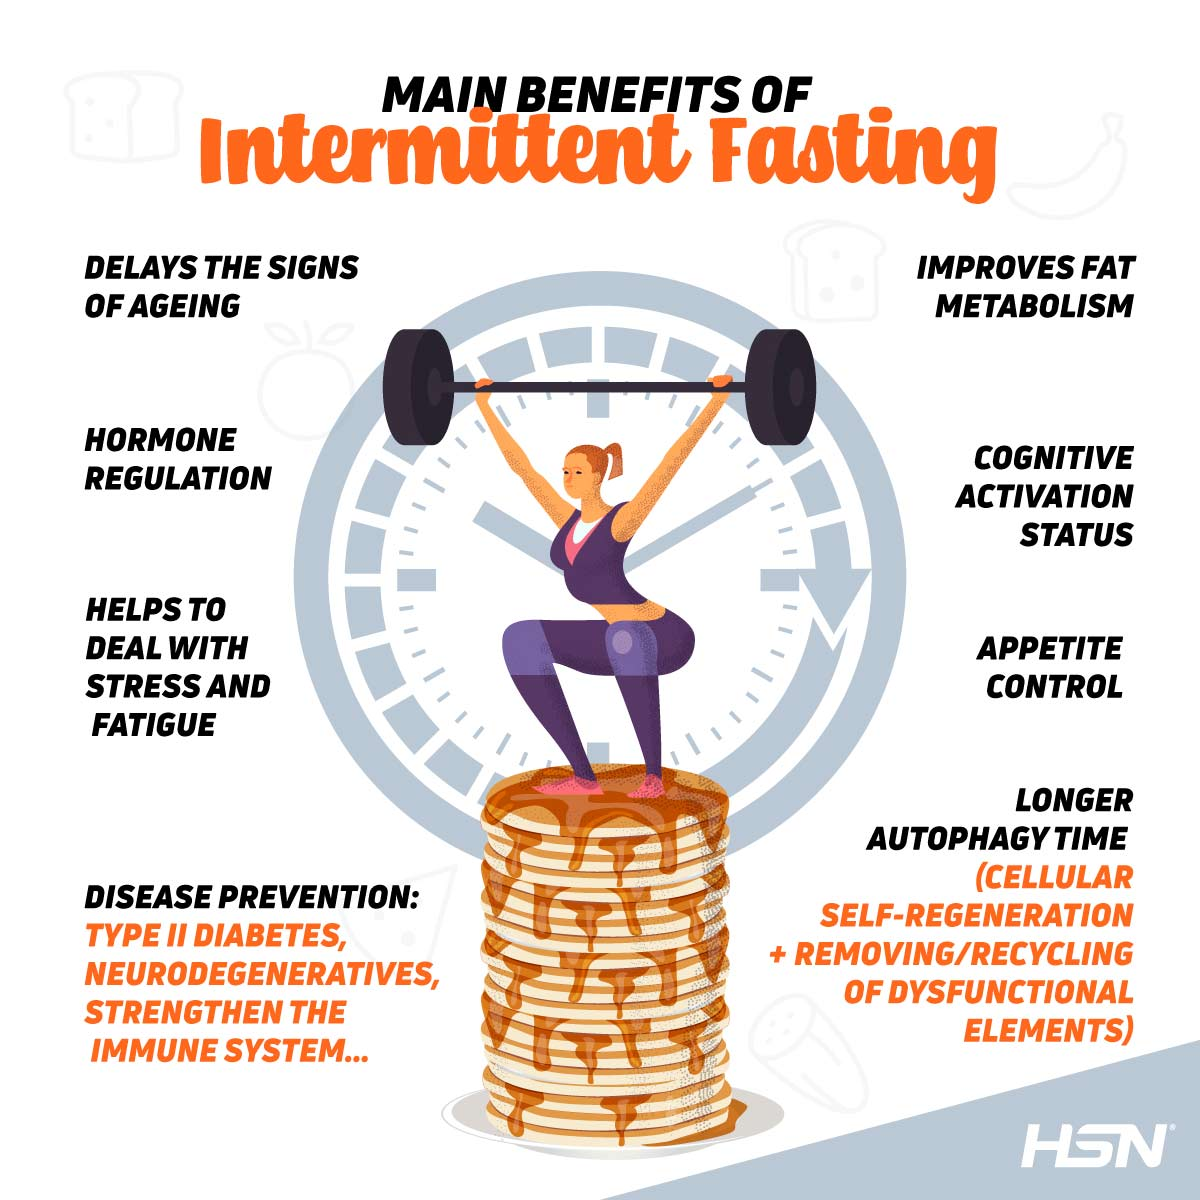 Main benefits of intermitent fasting